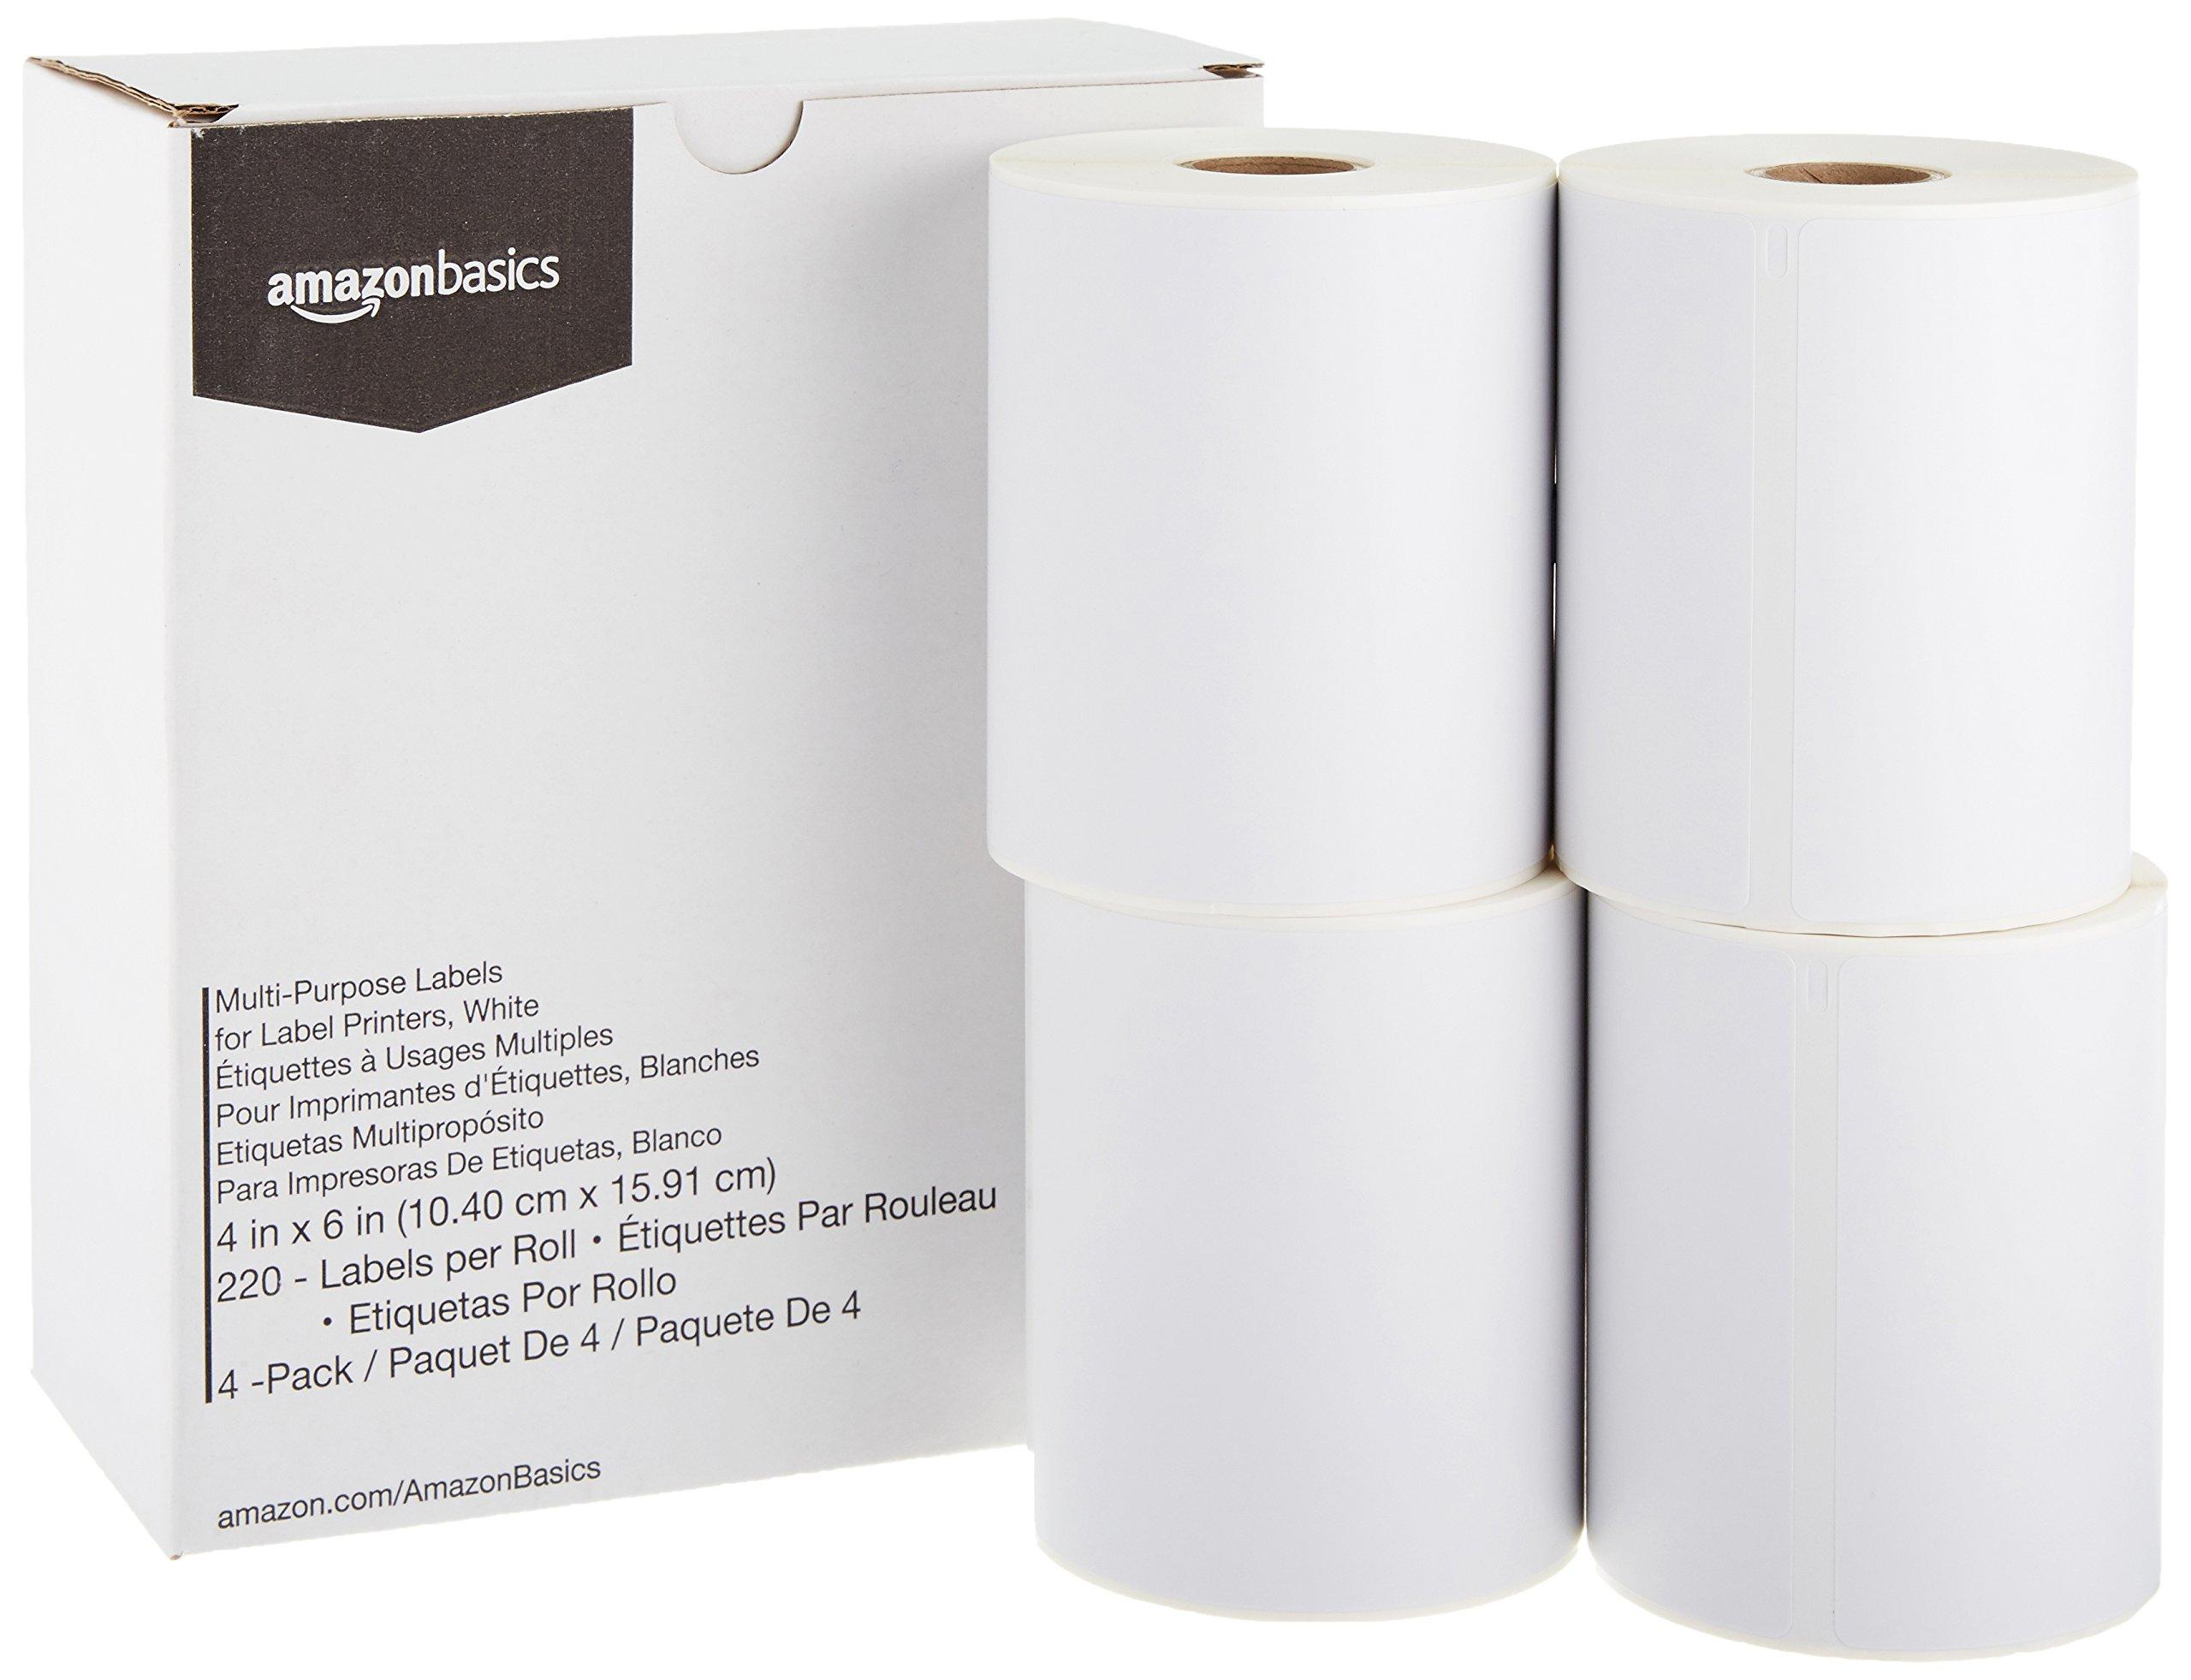 AmazonBasics Multi-Purpose Labels for Label Printers, White, 4'' x 6'', 220 Labels per Roll, 4 Rolls